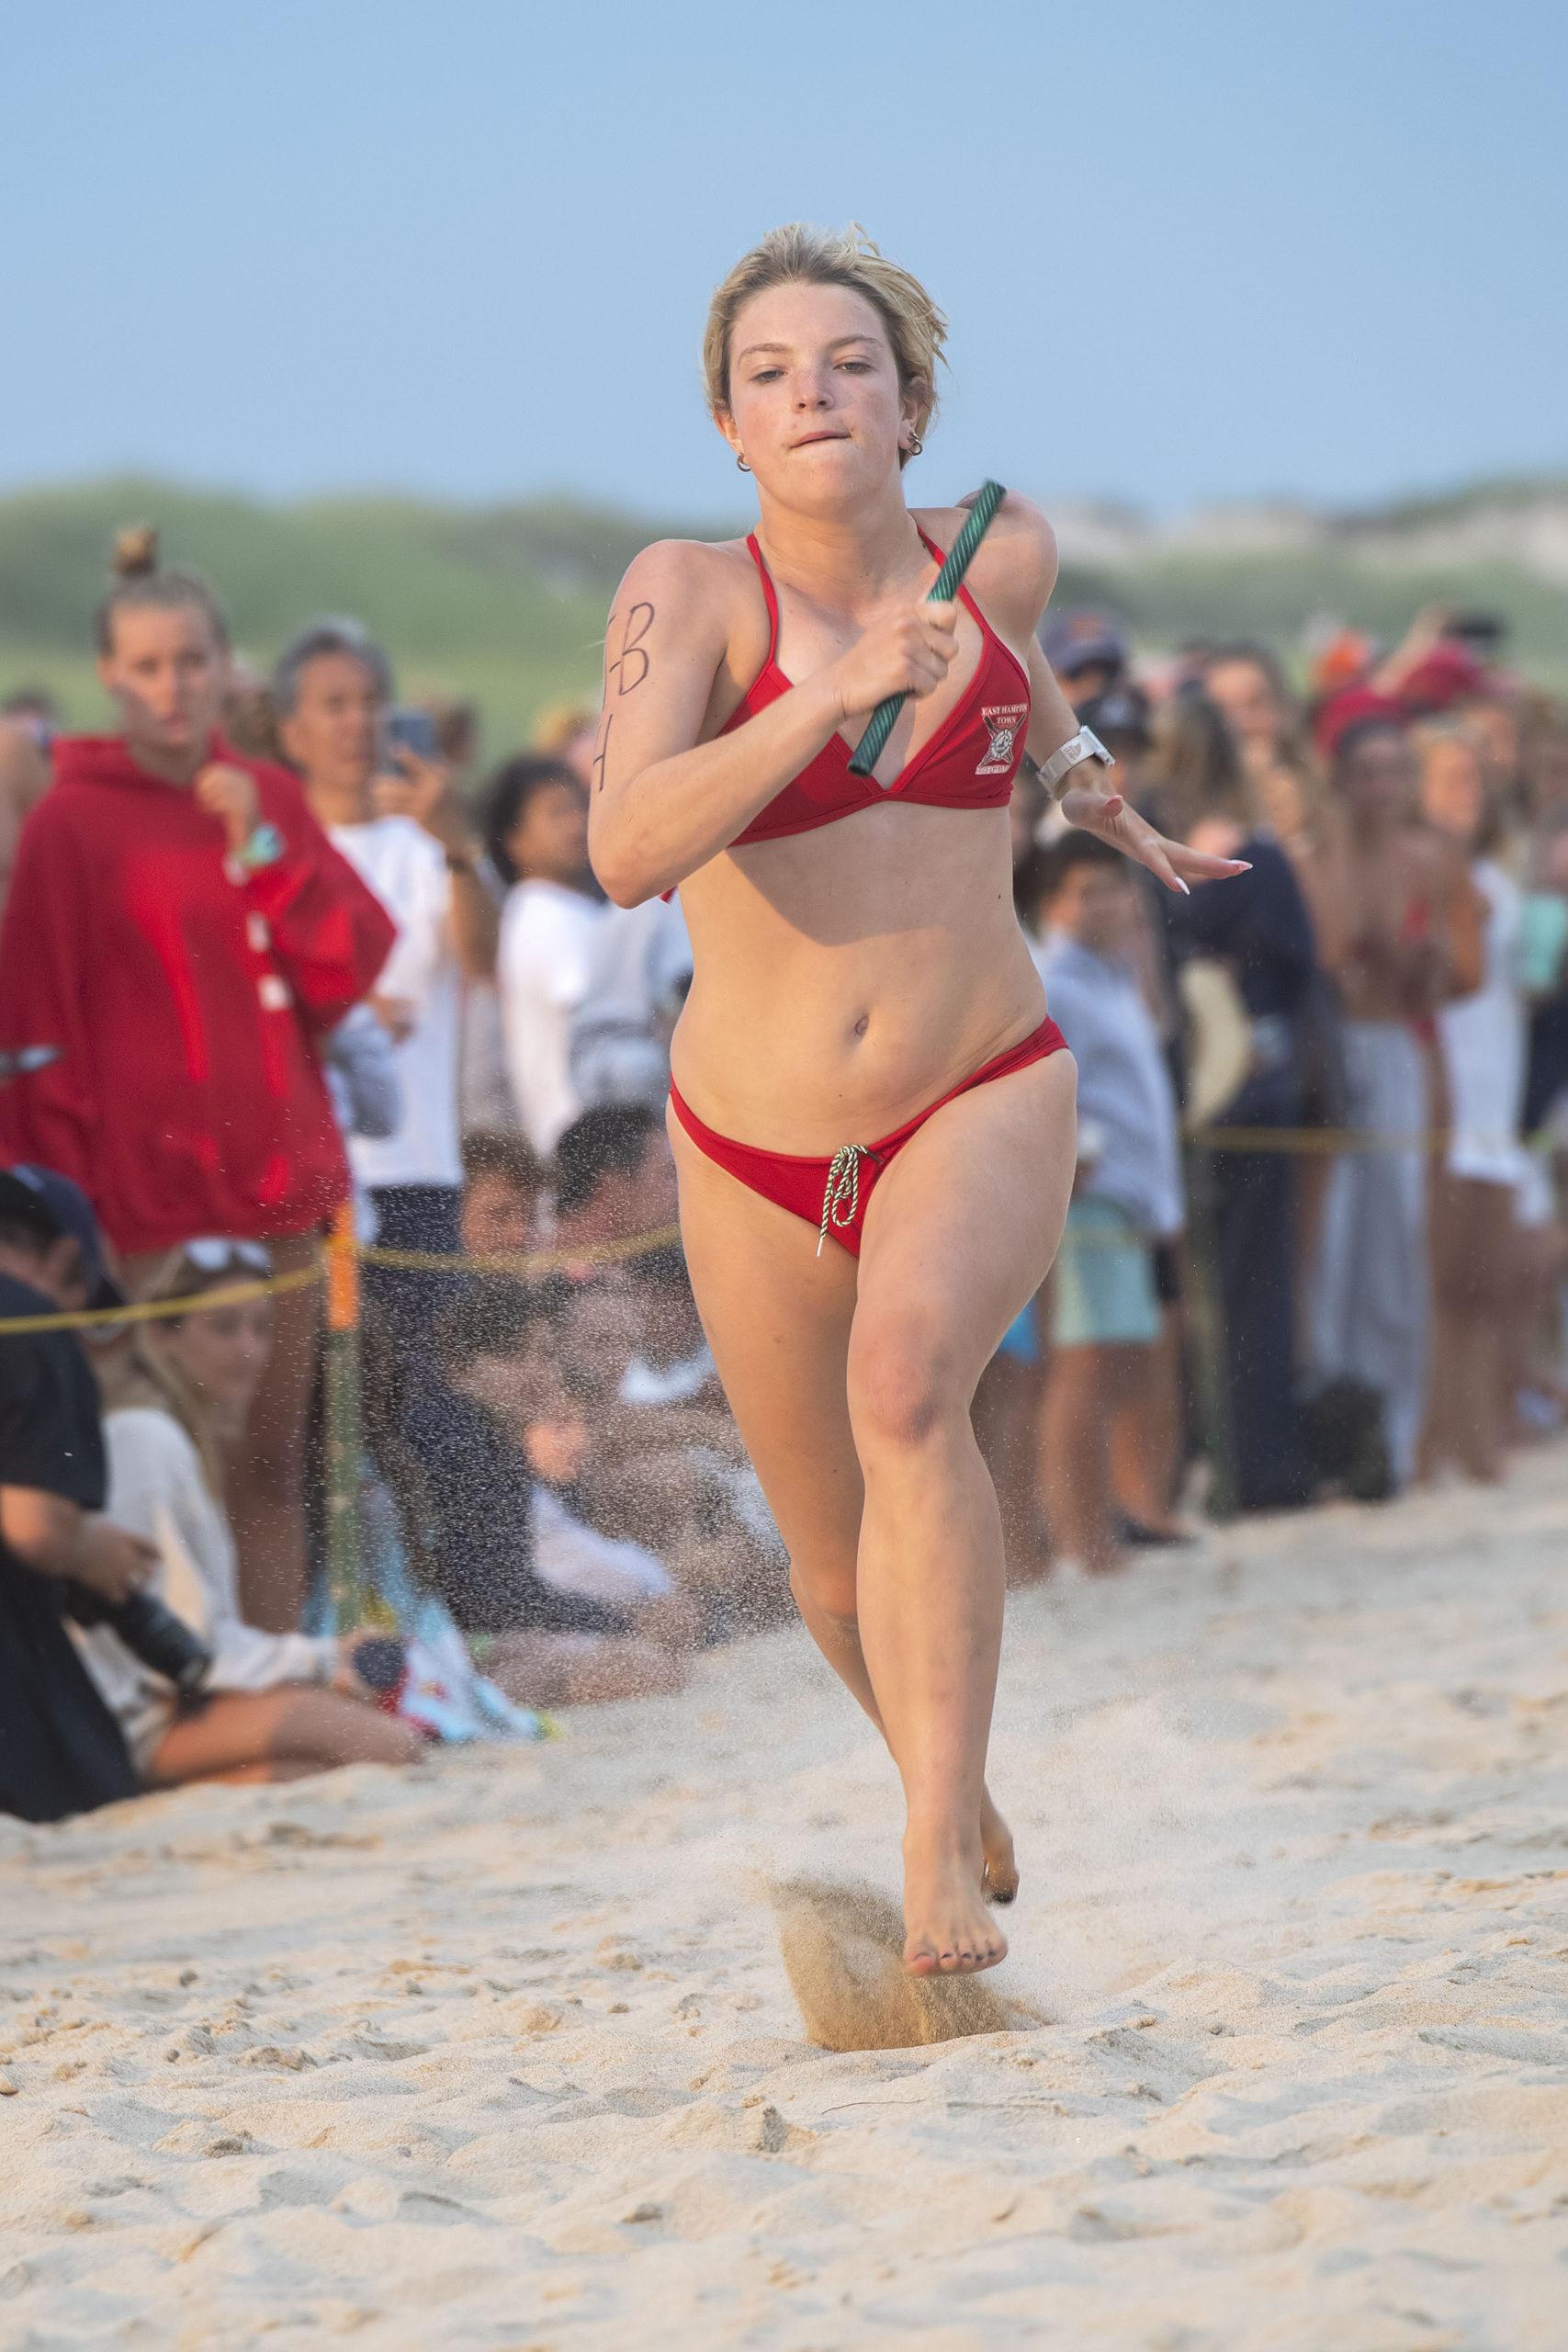 East Hampton Town lifeguard Julia Erickson runs in the women's sprint relay.